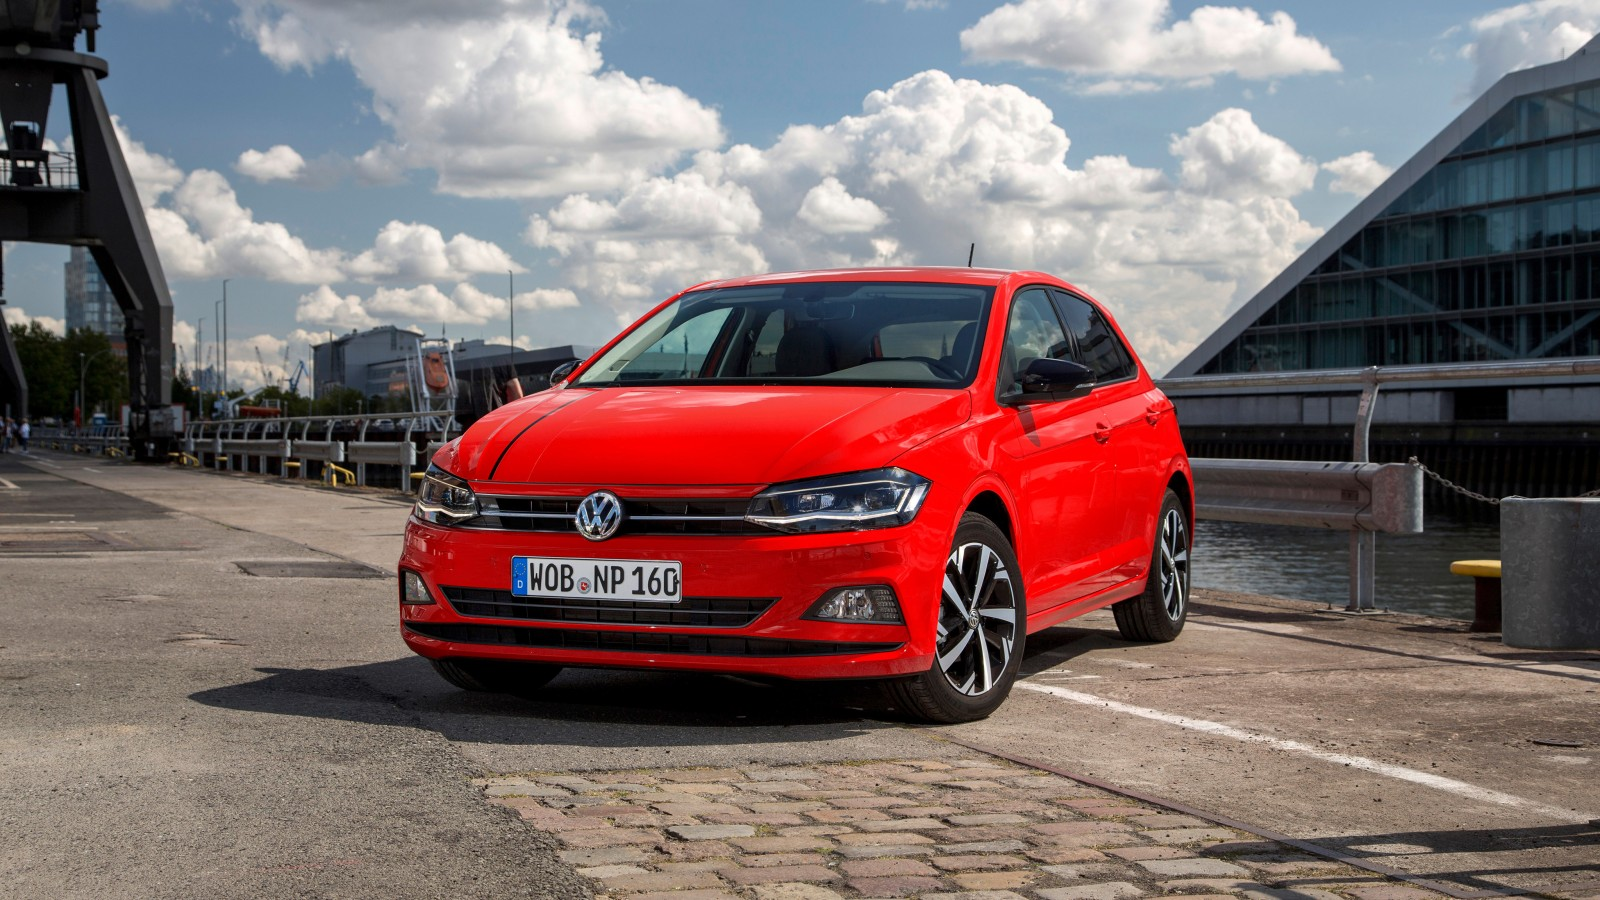 Widescreen Car Wallpaper 2017 Volkswagen Polo Beats 4k Wallpaper Hd Car